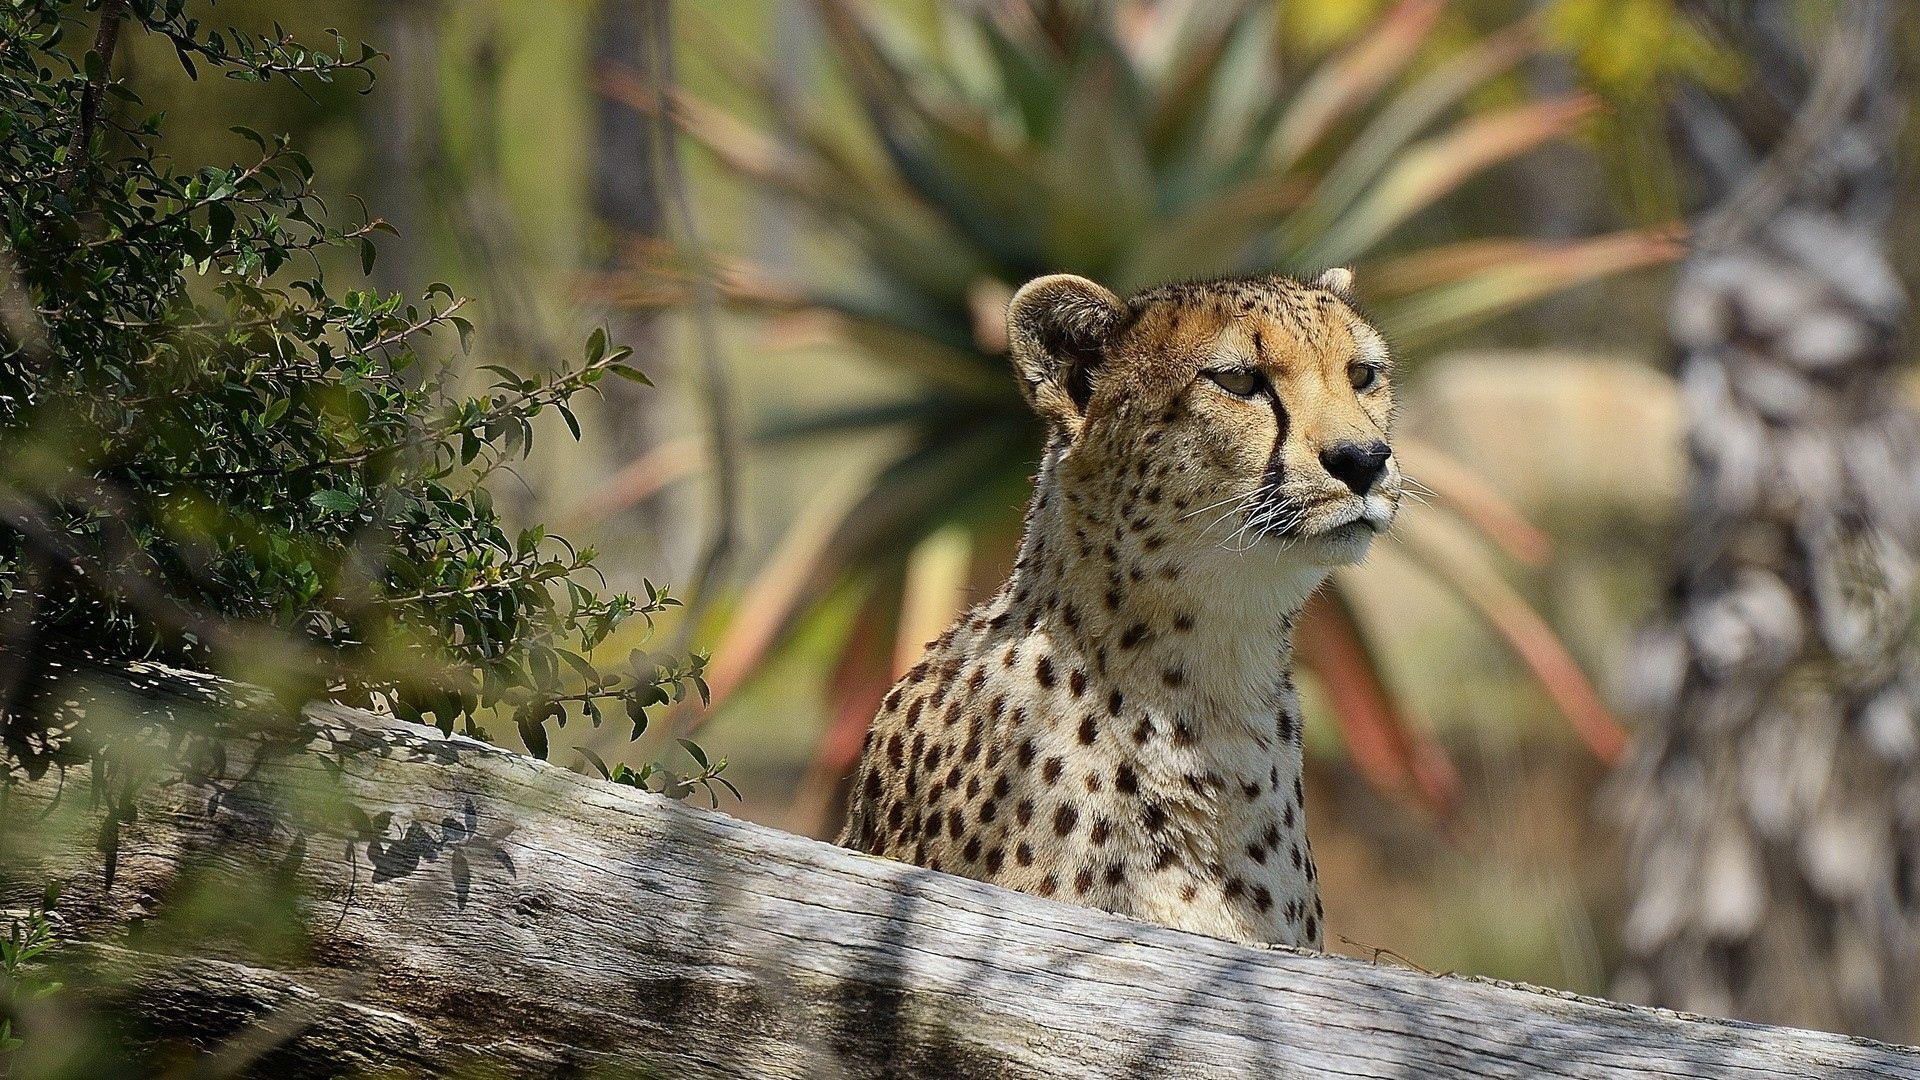 Cheetah Beautiful Photo